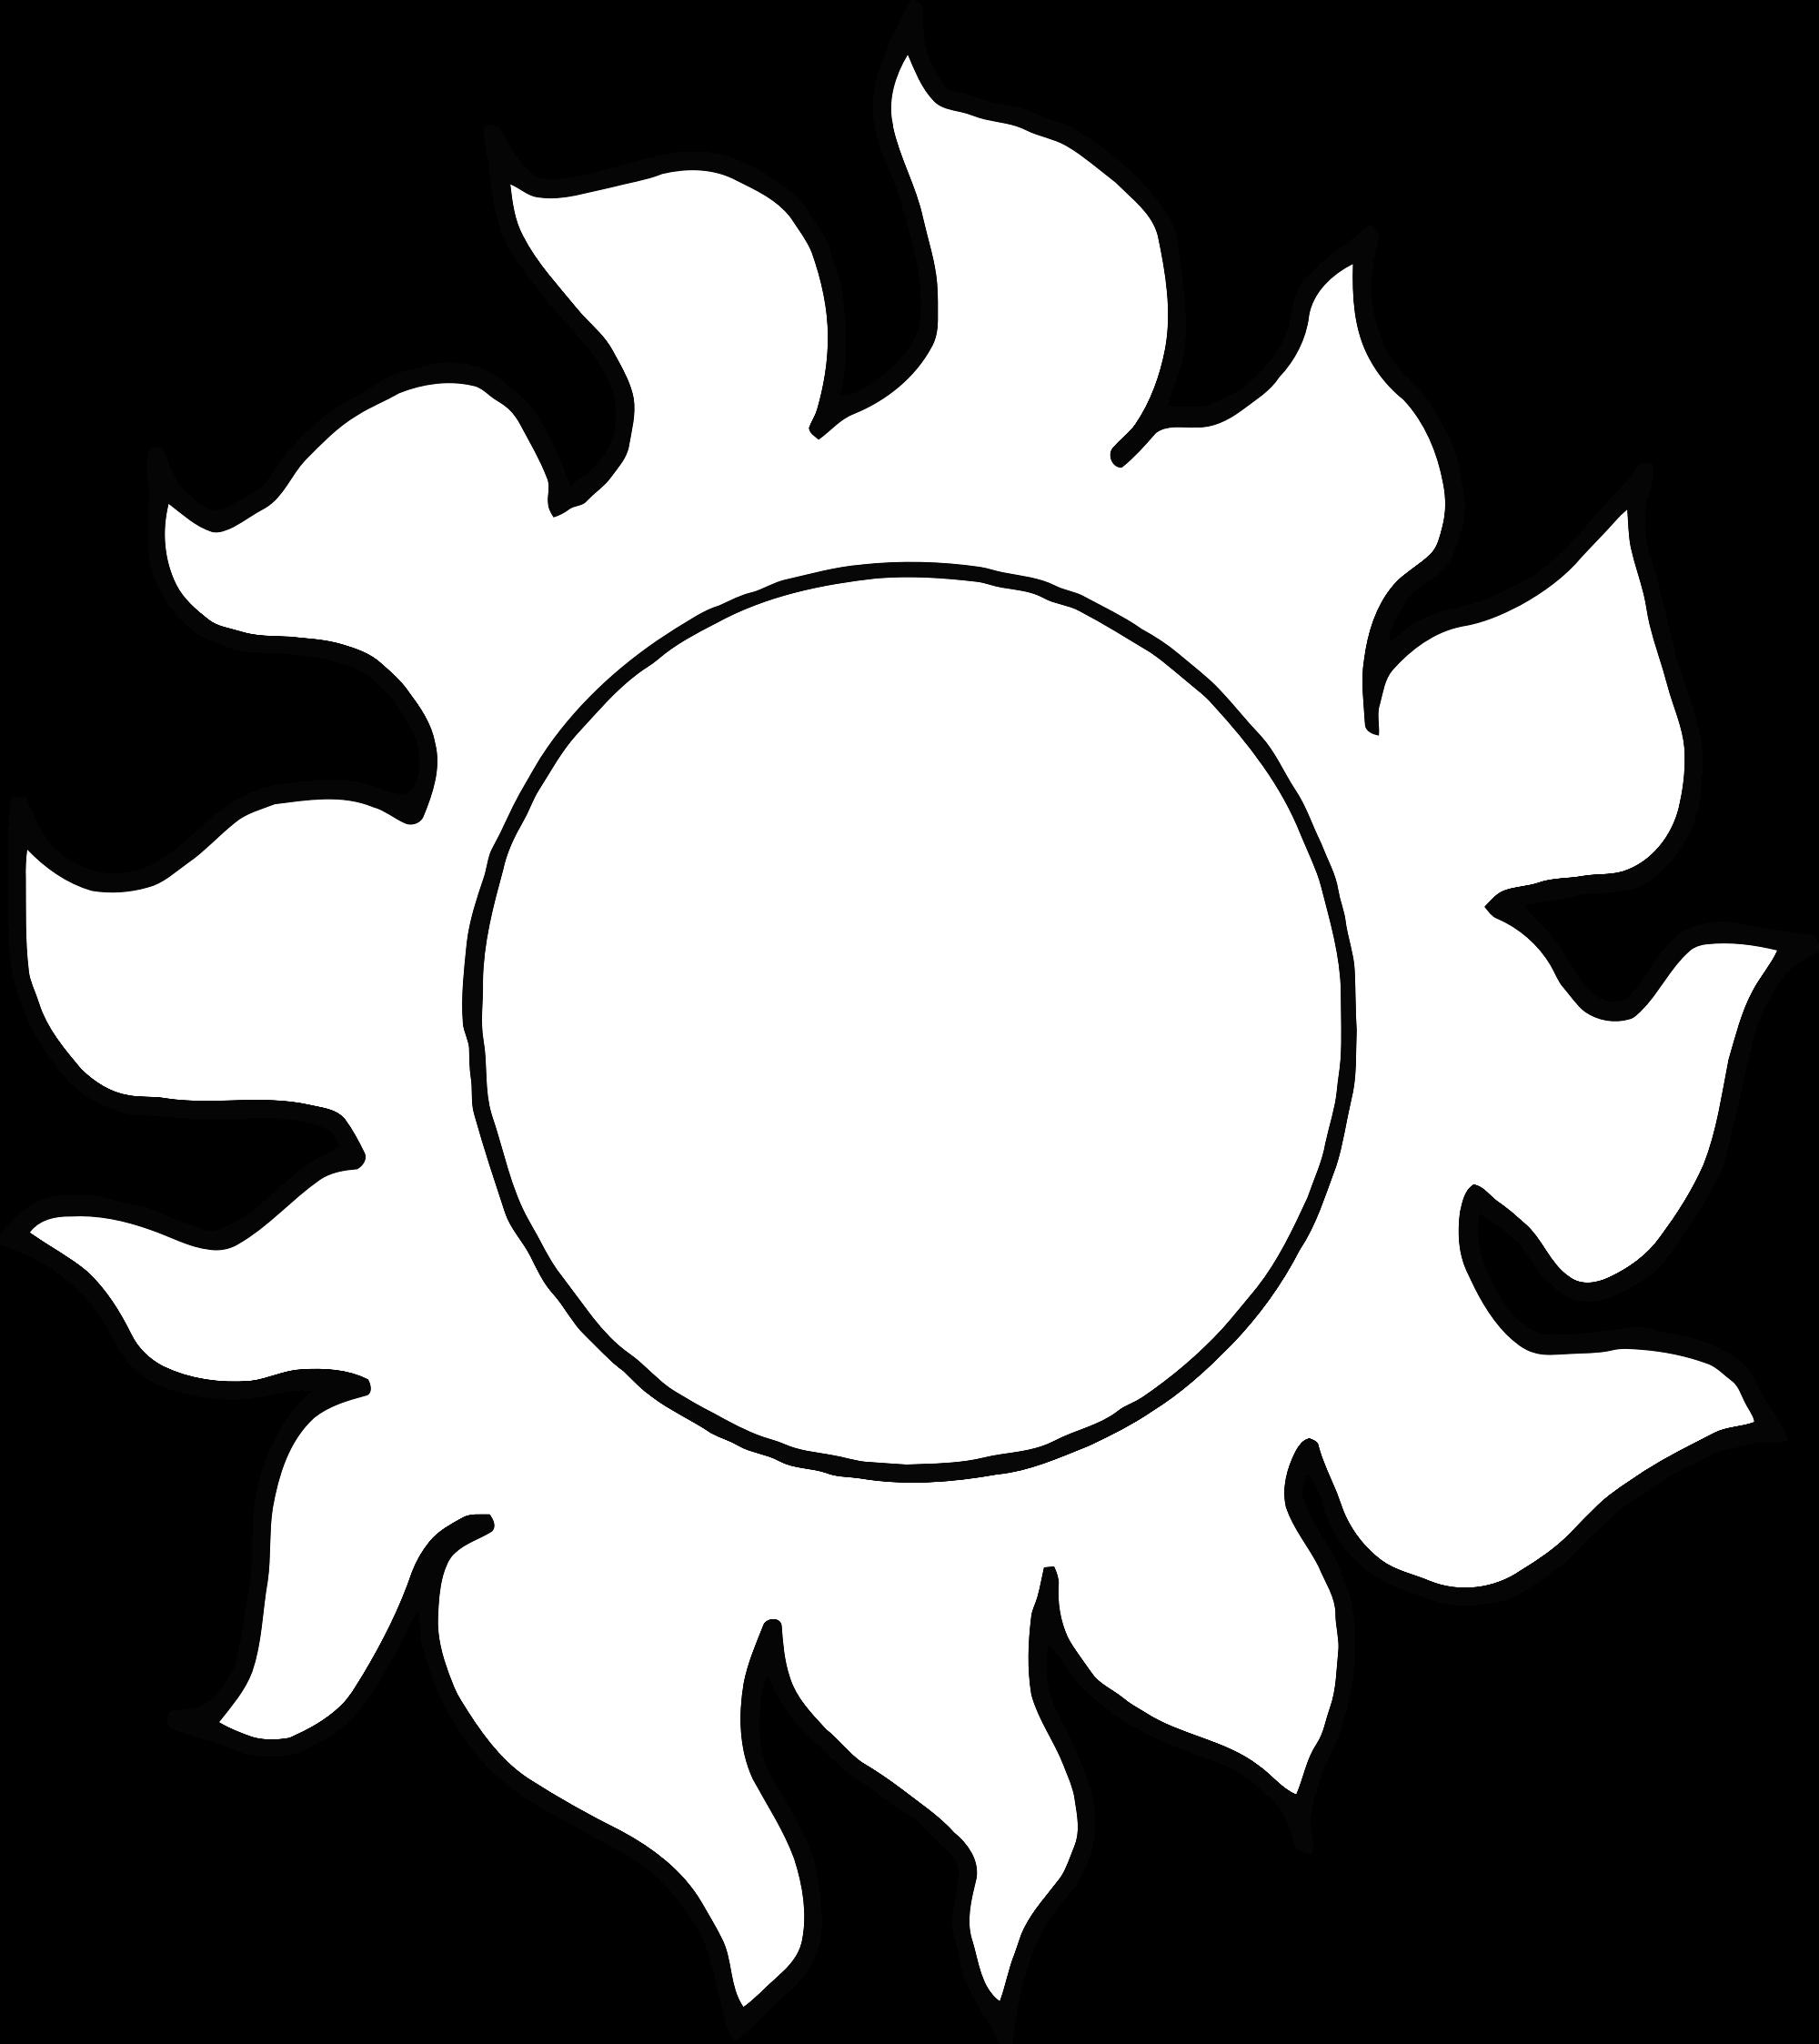 2000x2247 Sun Clipart Abstract